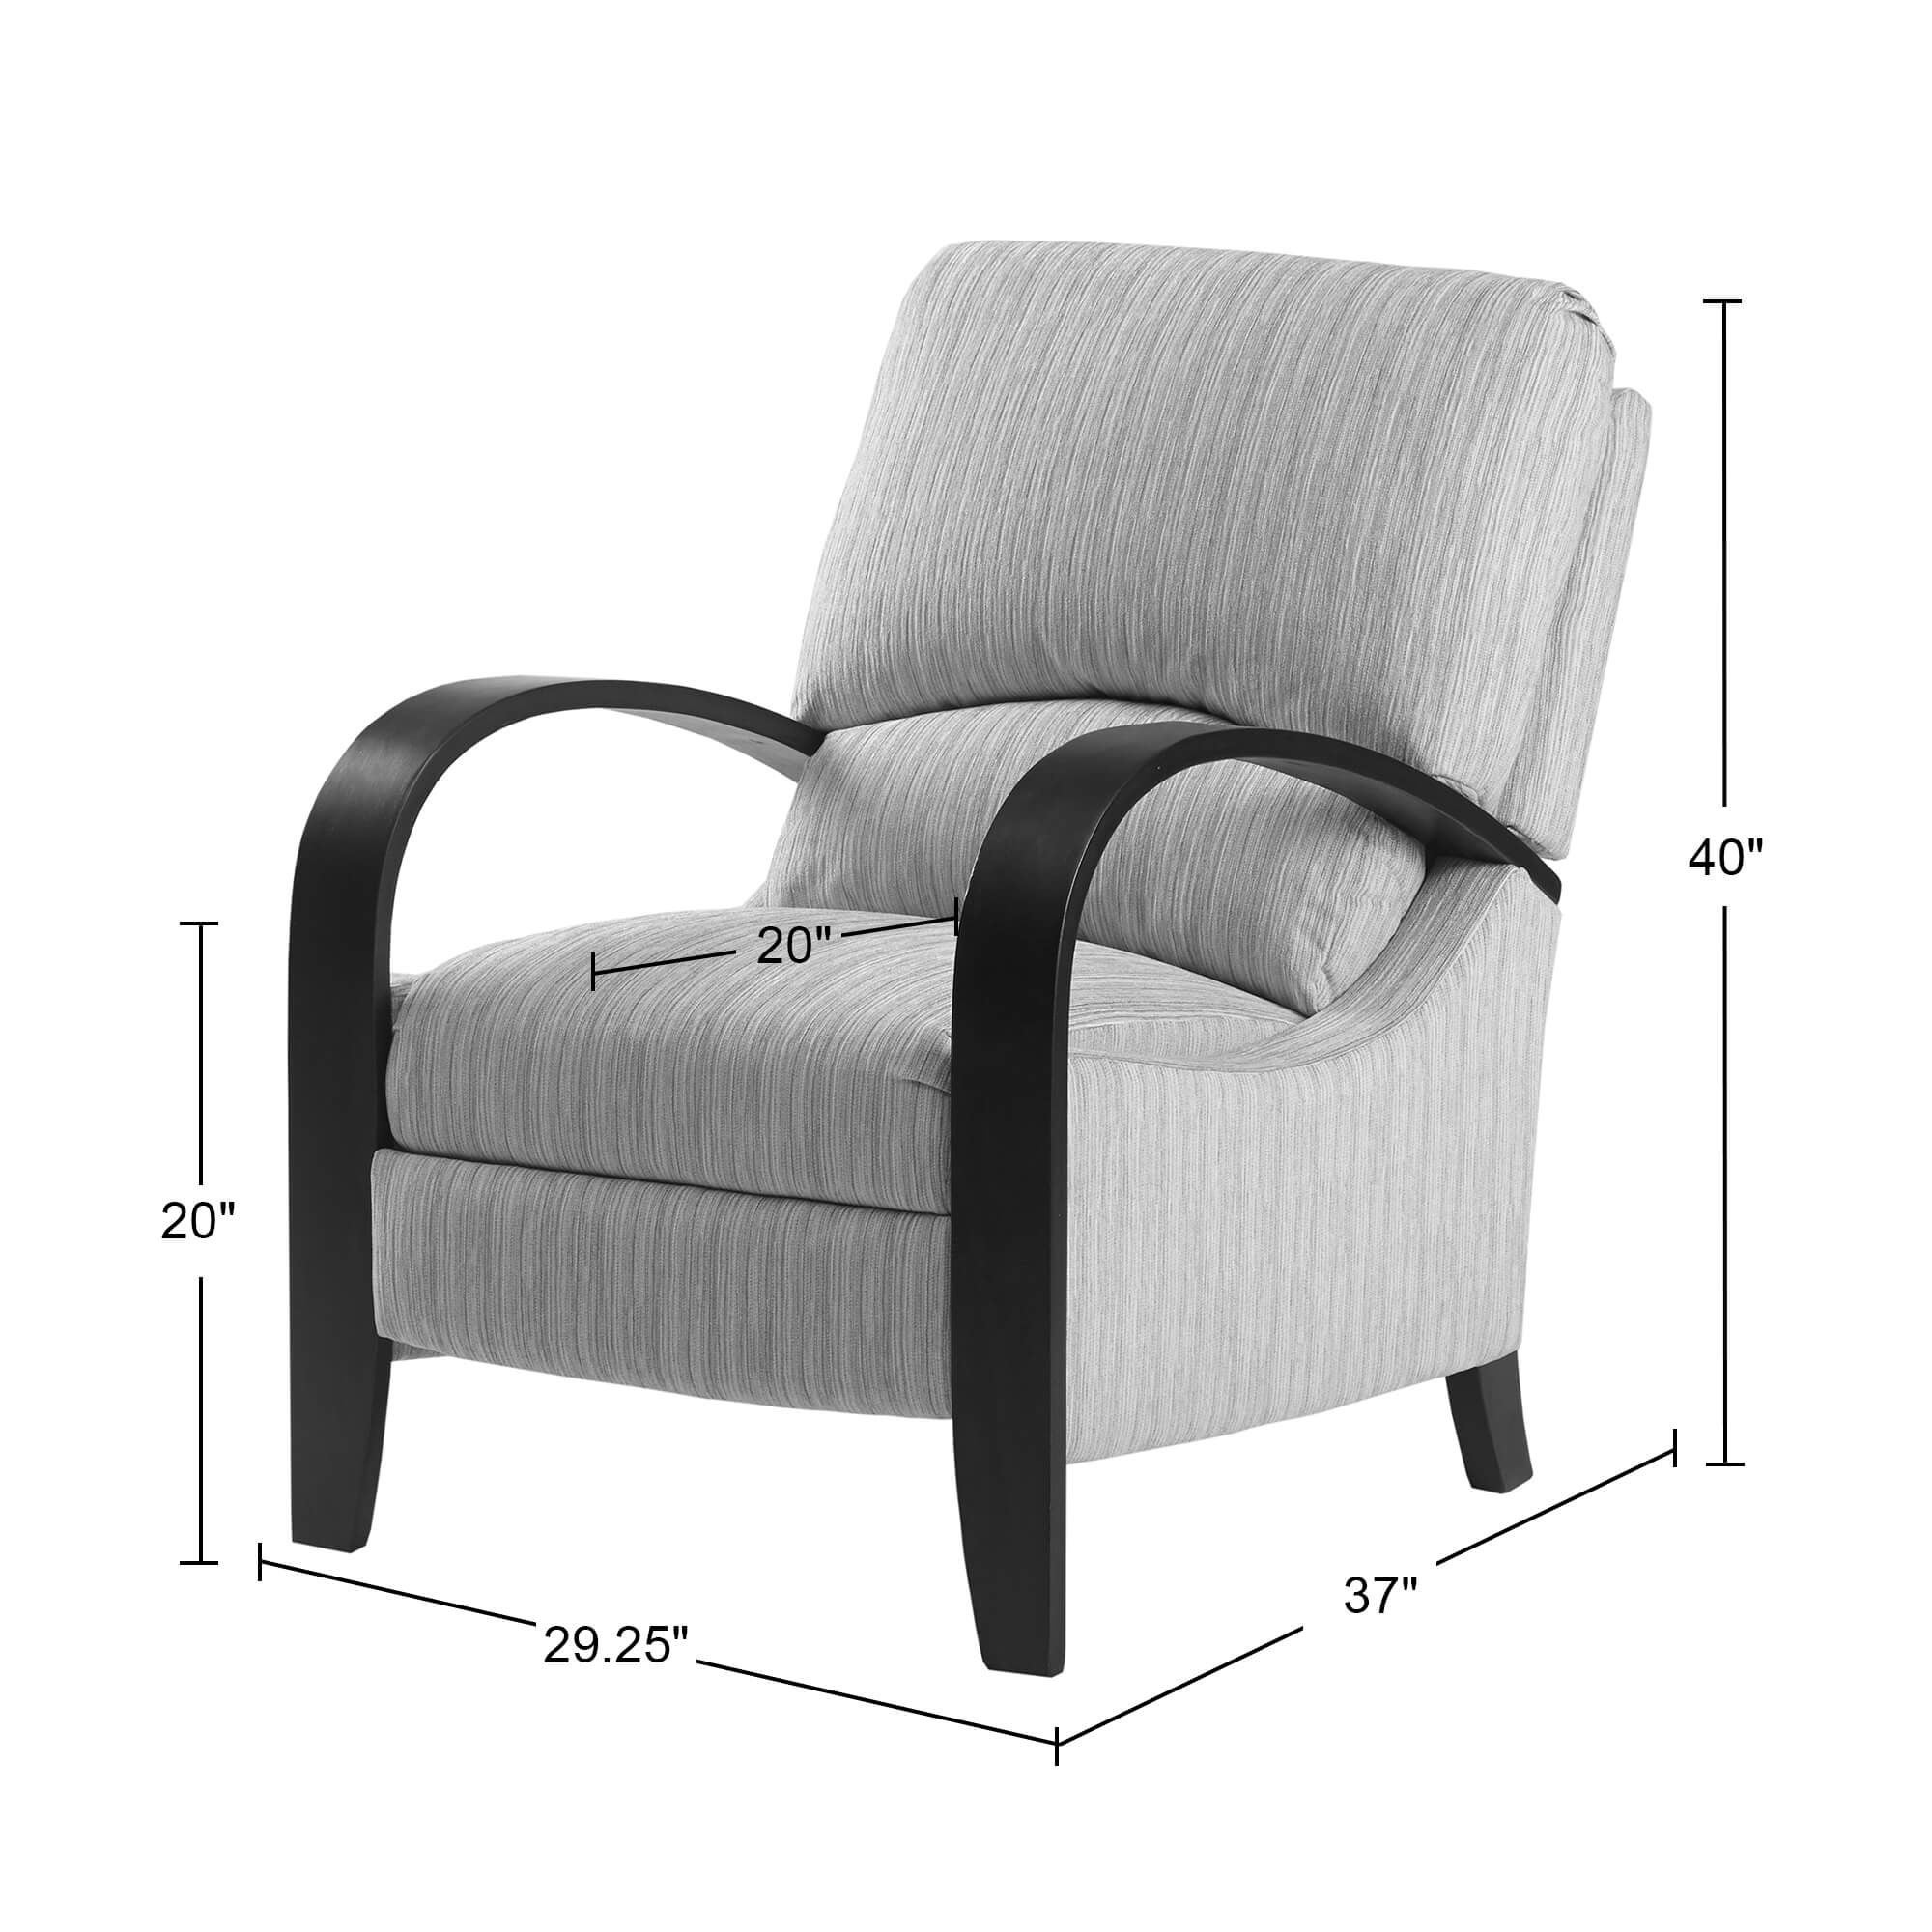 rocker stickley antique morris ordinary of photo x large gustav recliner inspired bent arm reclining slant chair